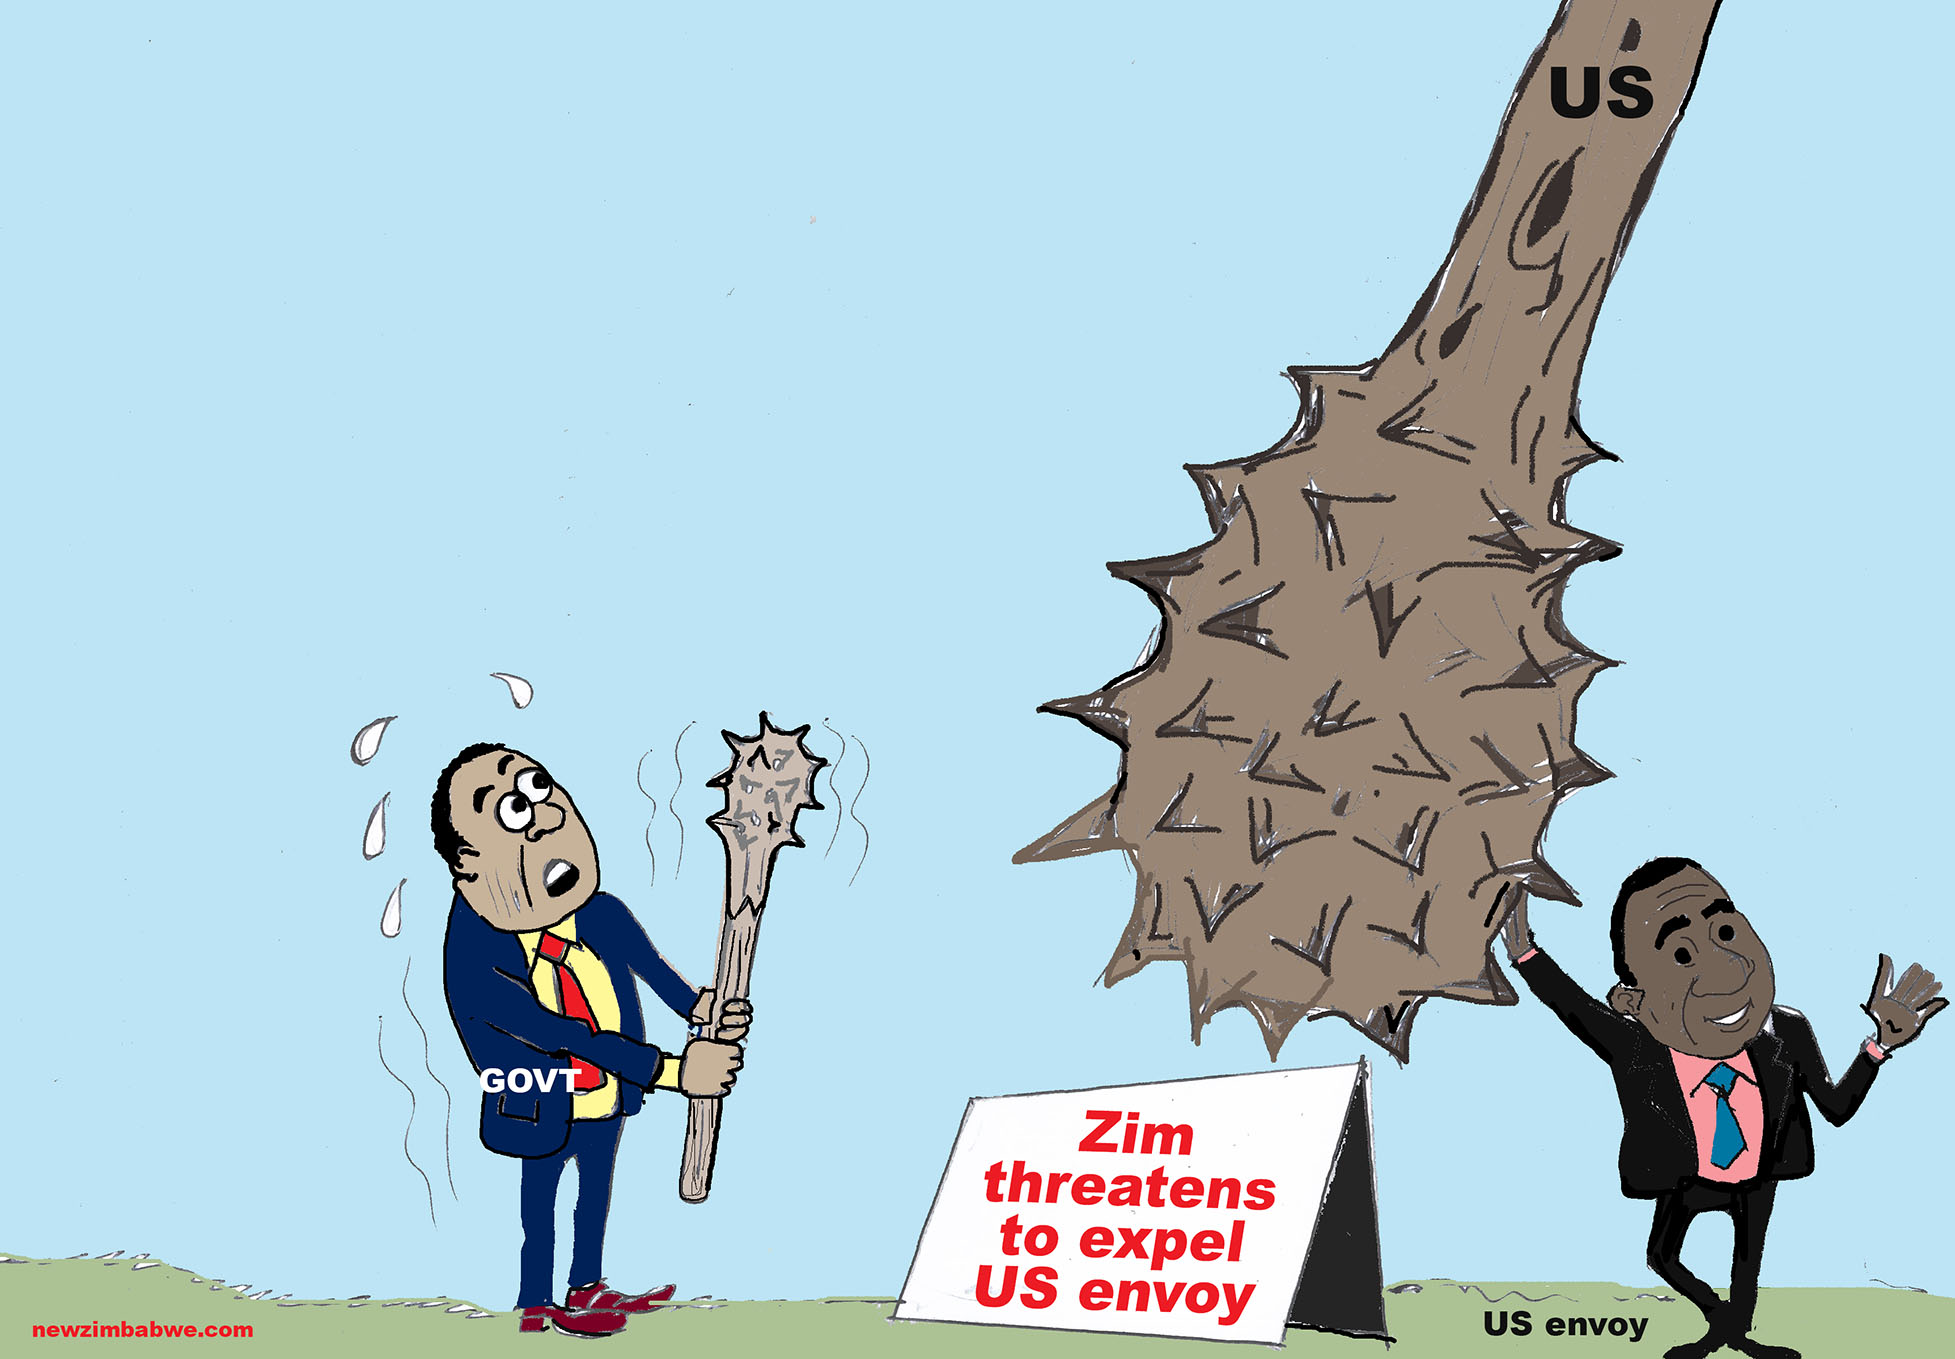 Zim threatens US envoy